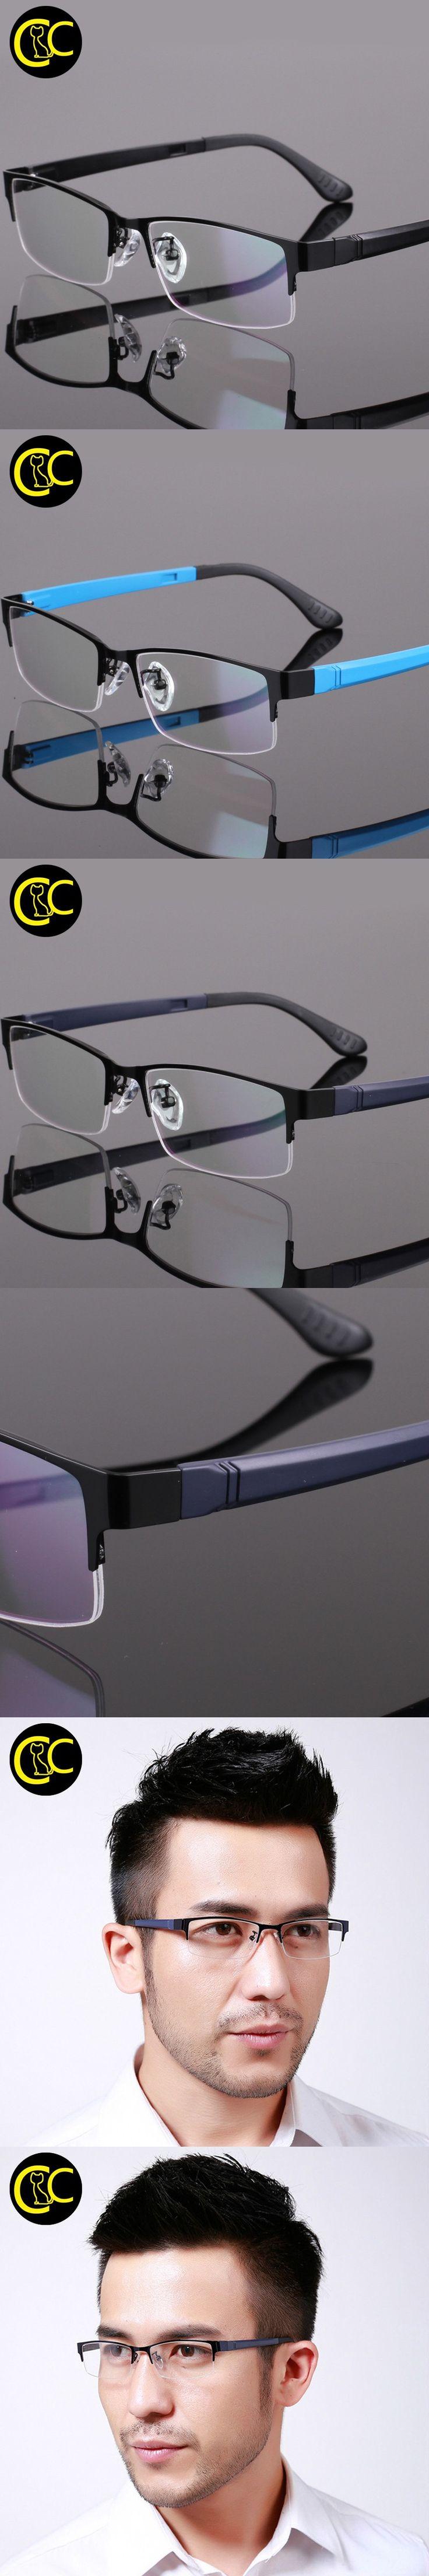 Men Optical Frames Myopia Titanium Glasses Frame Eye glasses Frames for Men Prescription Eyewear Oculos Lunette de vue CC0840 $11.41